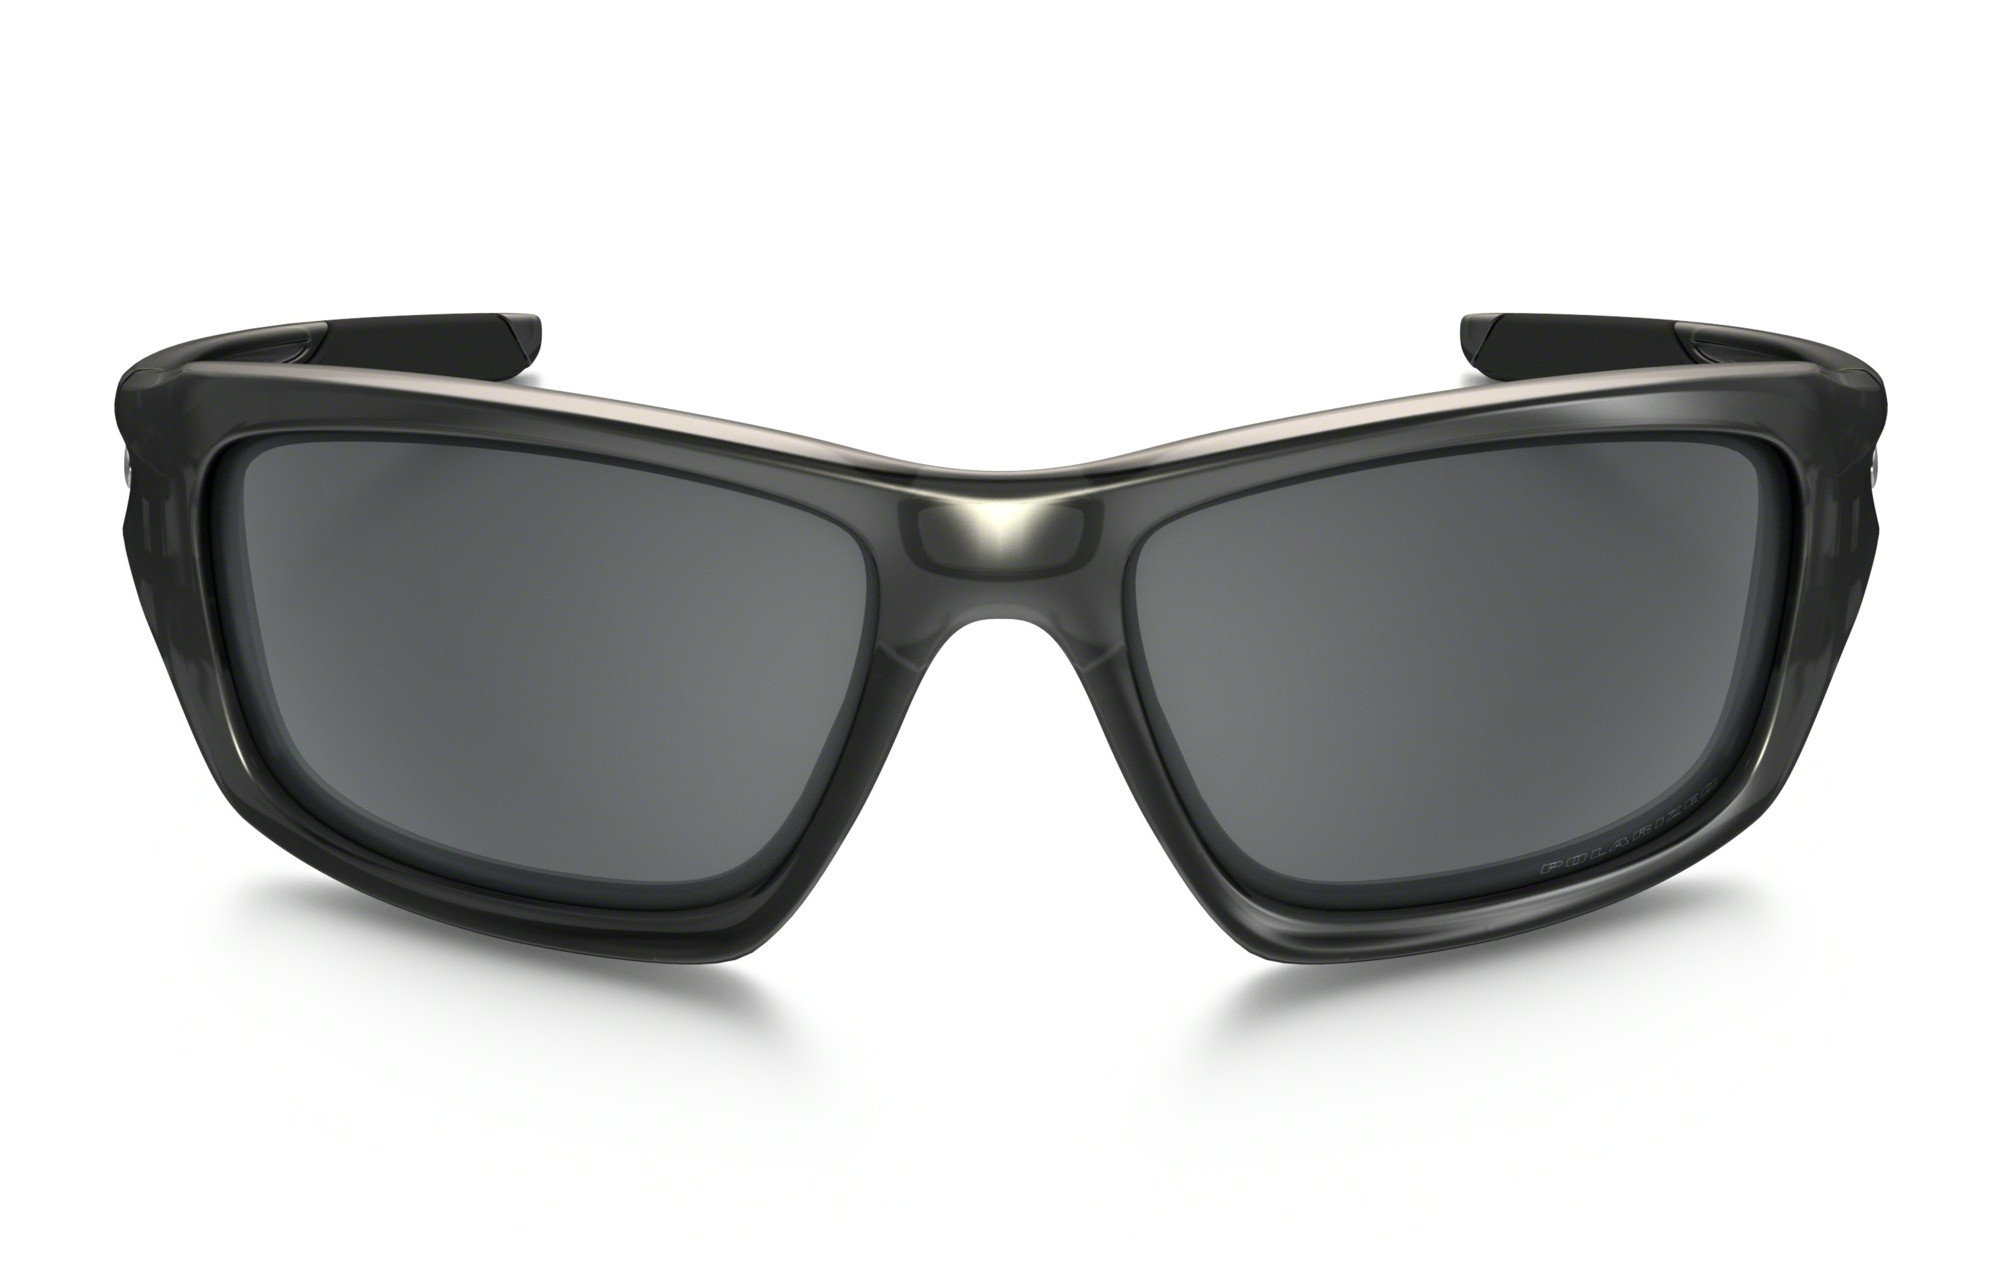 5d62631f2a4c70 OAKLEY Sunglasses VALVE Matte Grey Smoke Black Iridium Polarized Ref  OO9236-06